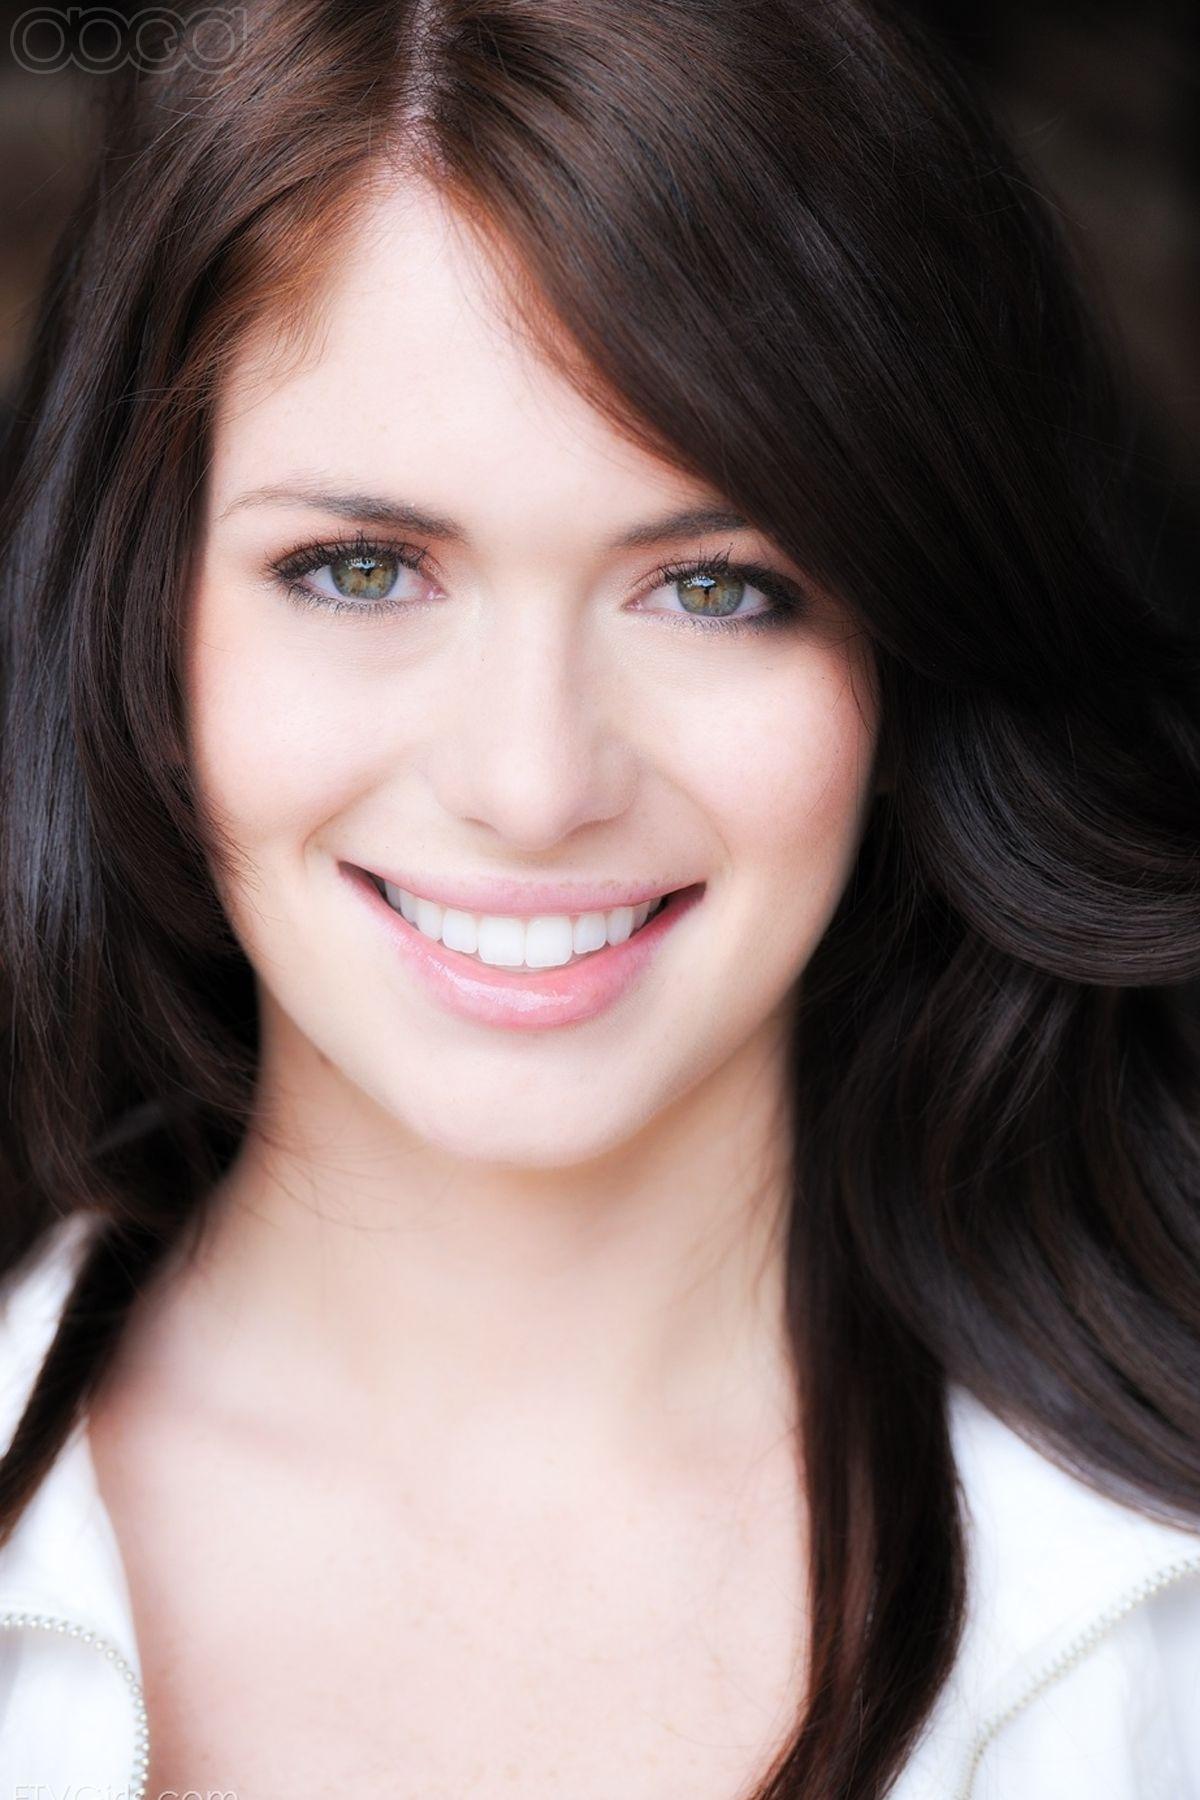 ashlyn rae | girls to say hello! | pinterest | girls